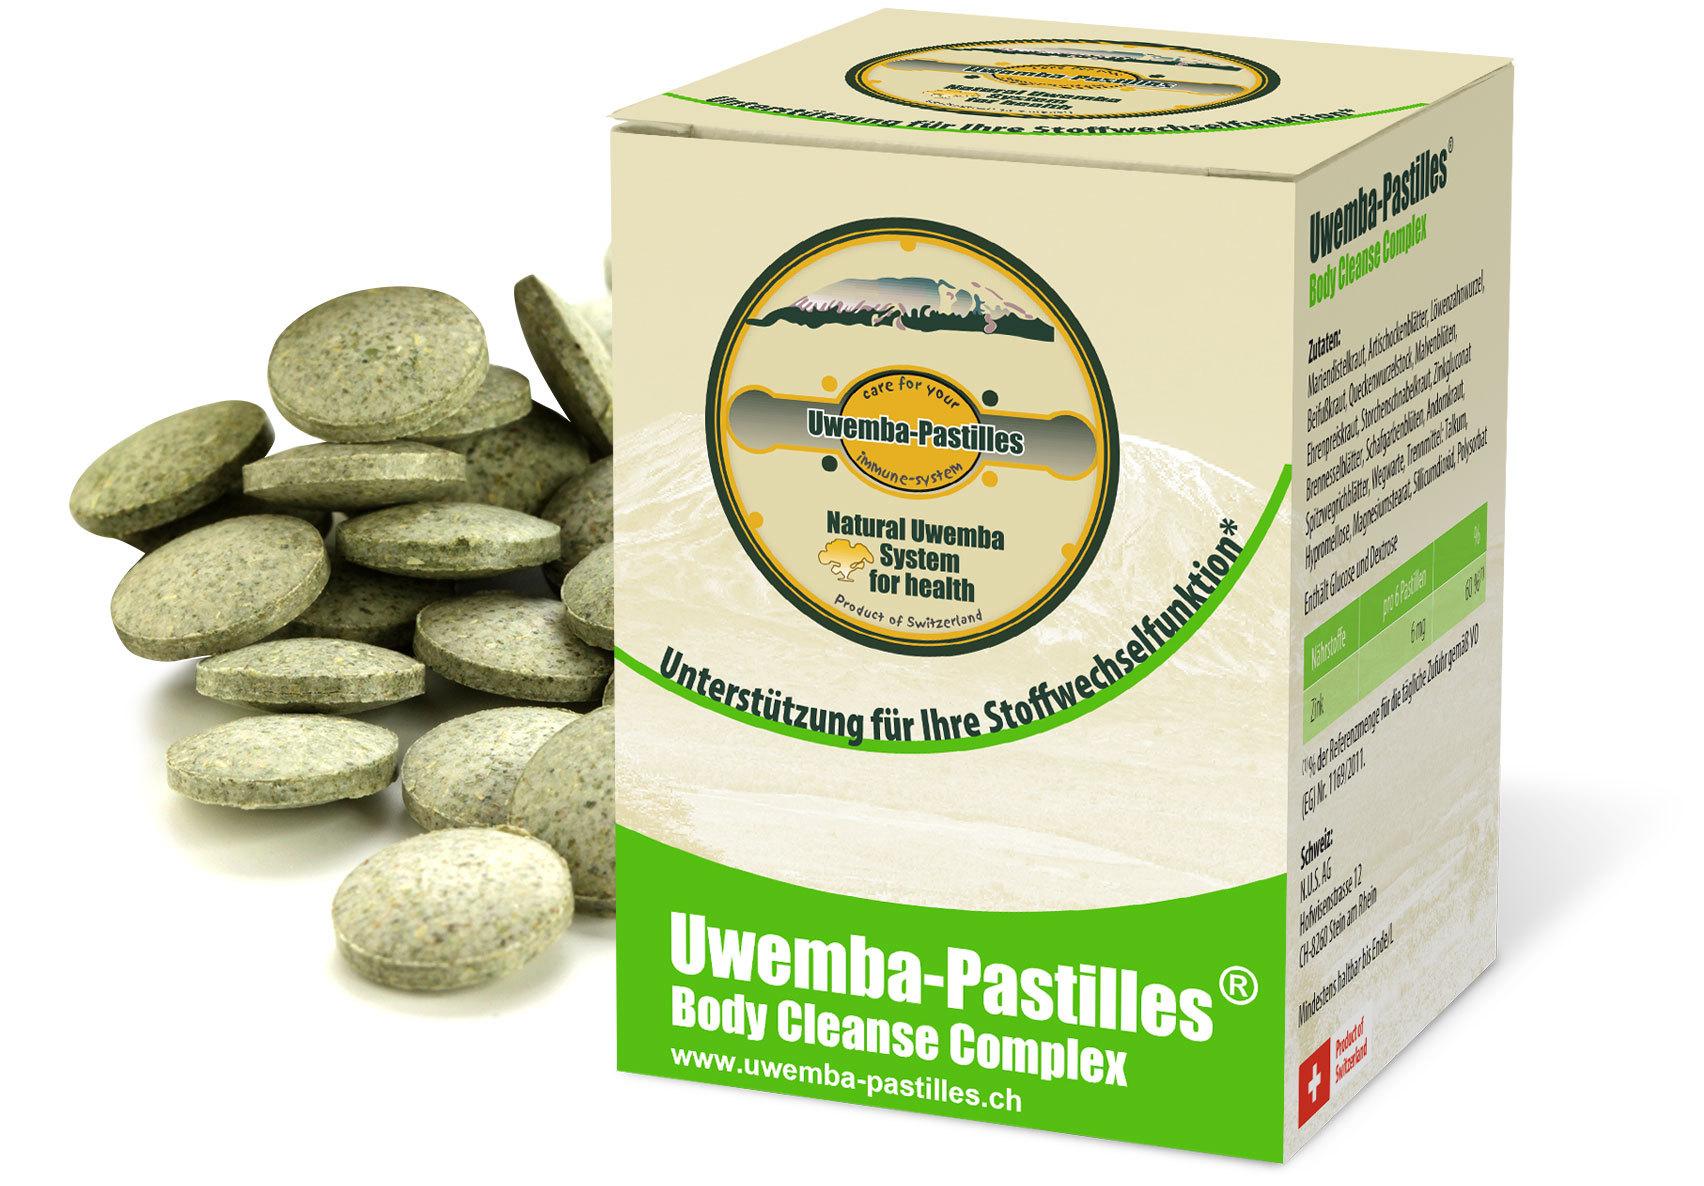 Uwemba-Pastilles® Body Cleanse Complex